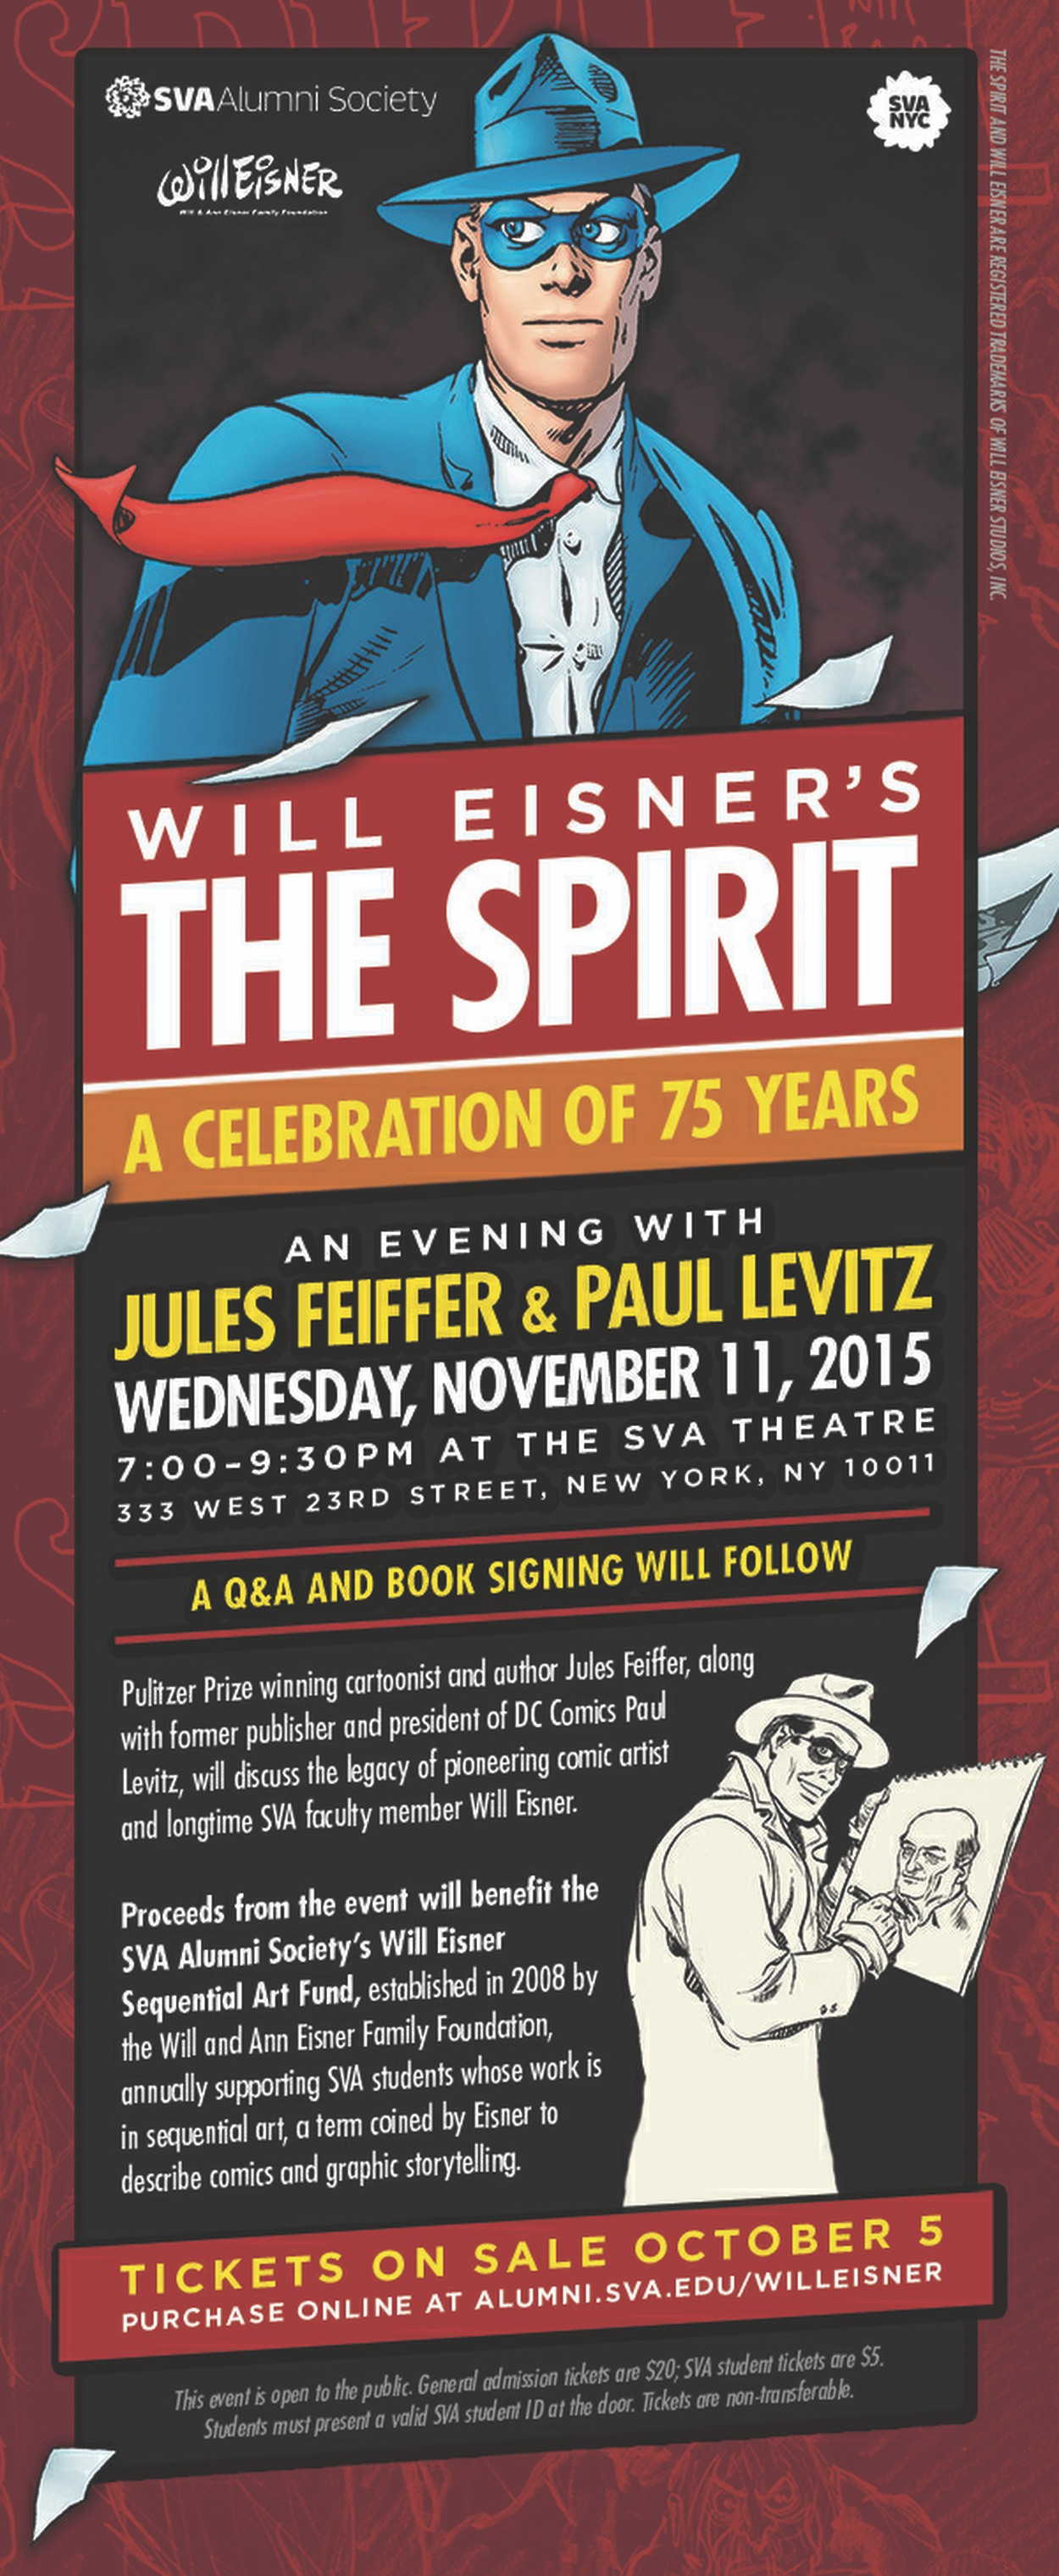 http://www.willeisner.com/the_eisnershpritz/WEFF_SVA_Fundraiser_Flyer.jpg